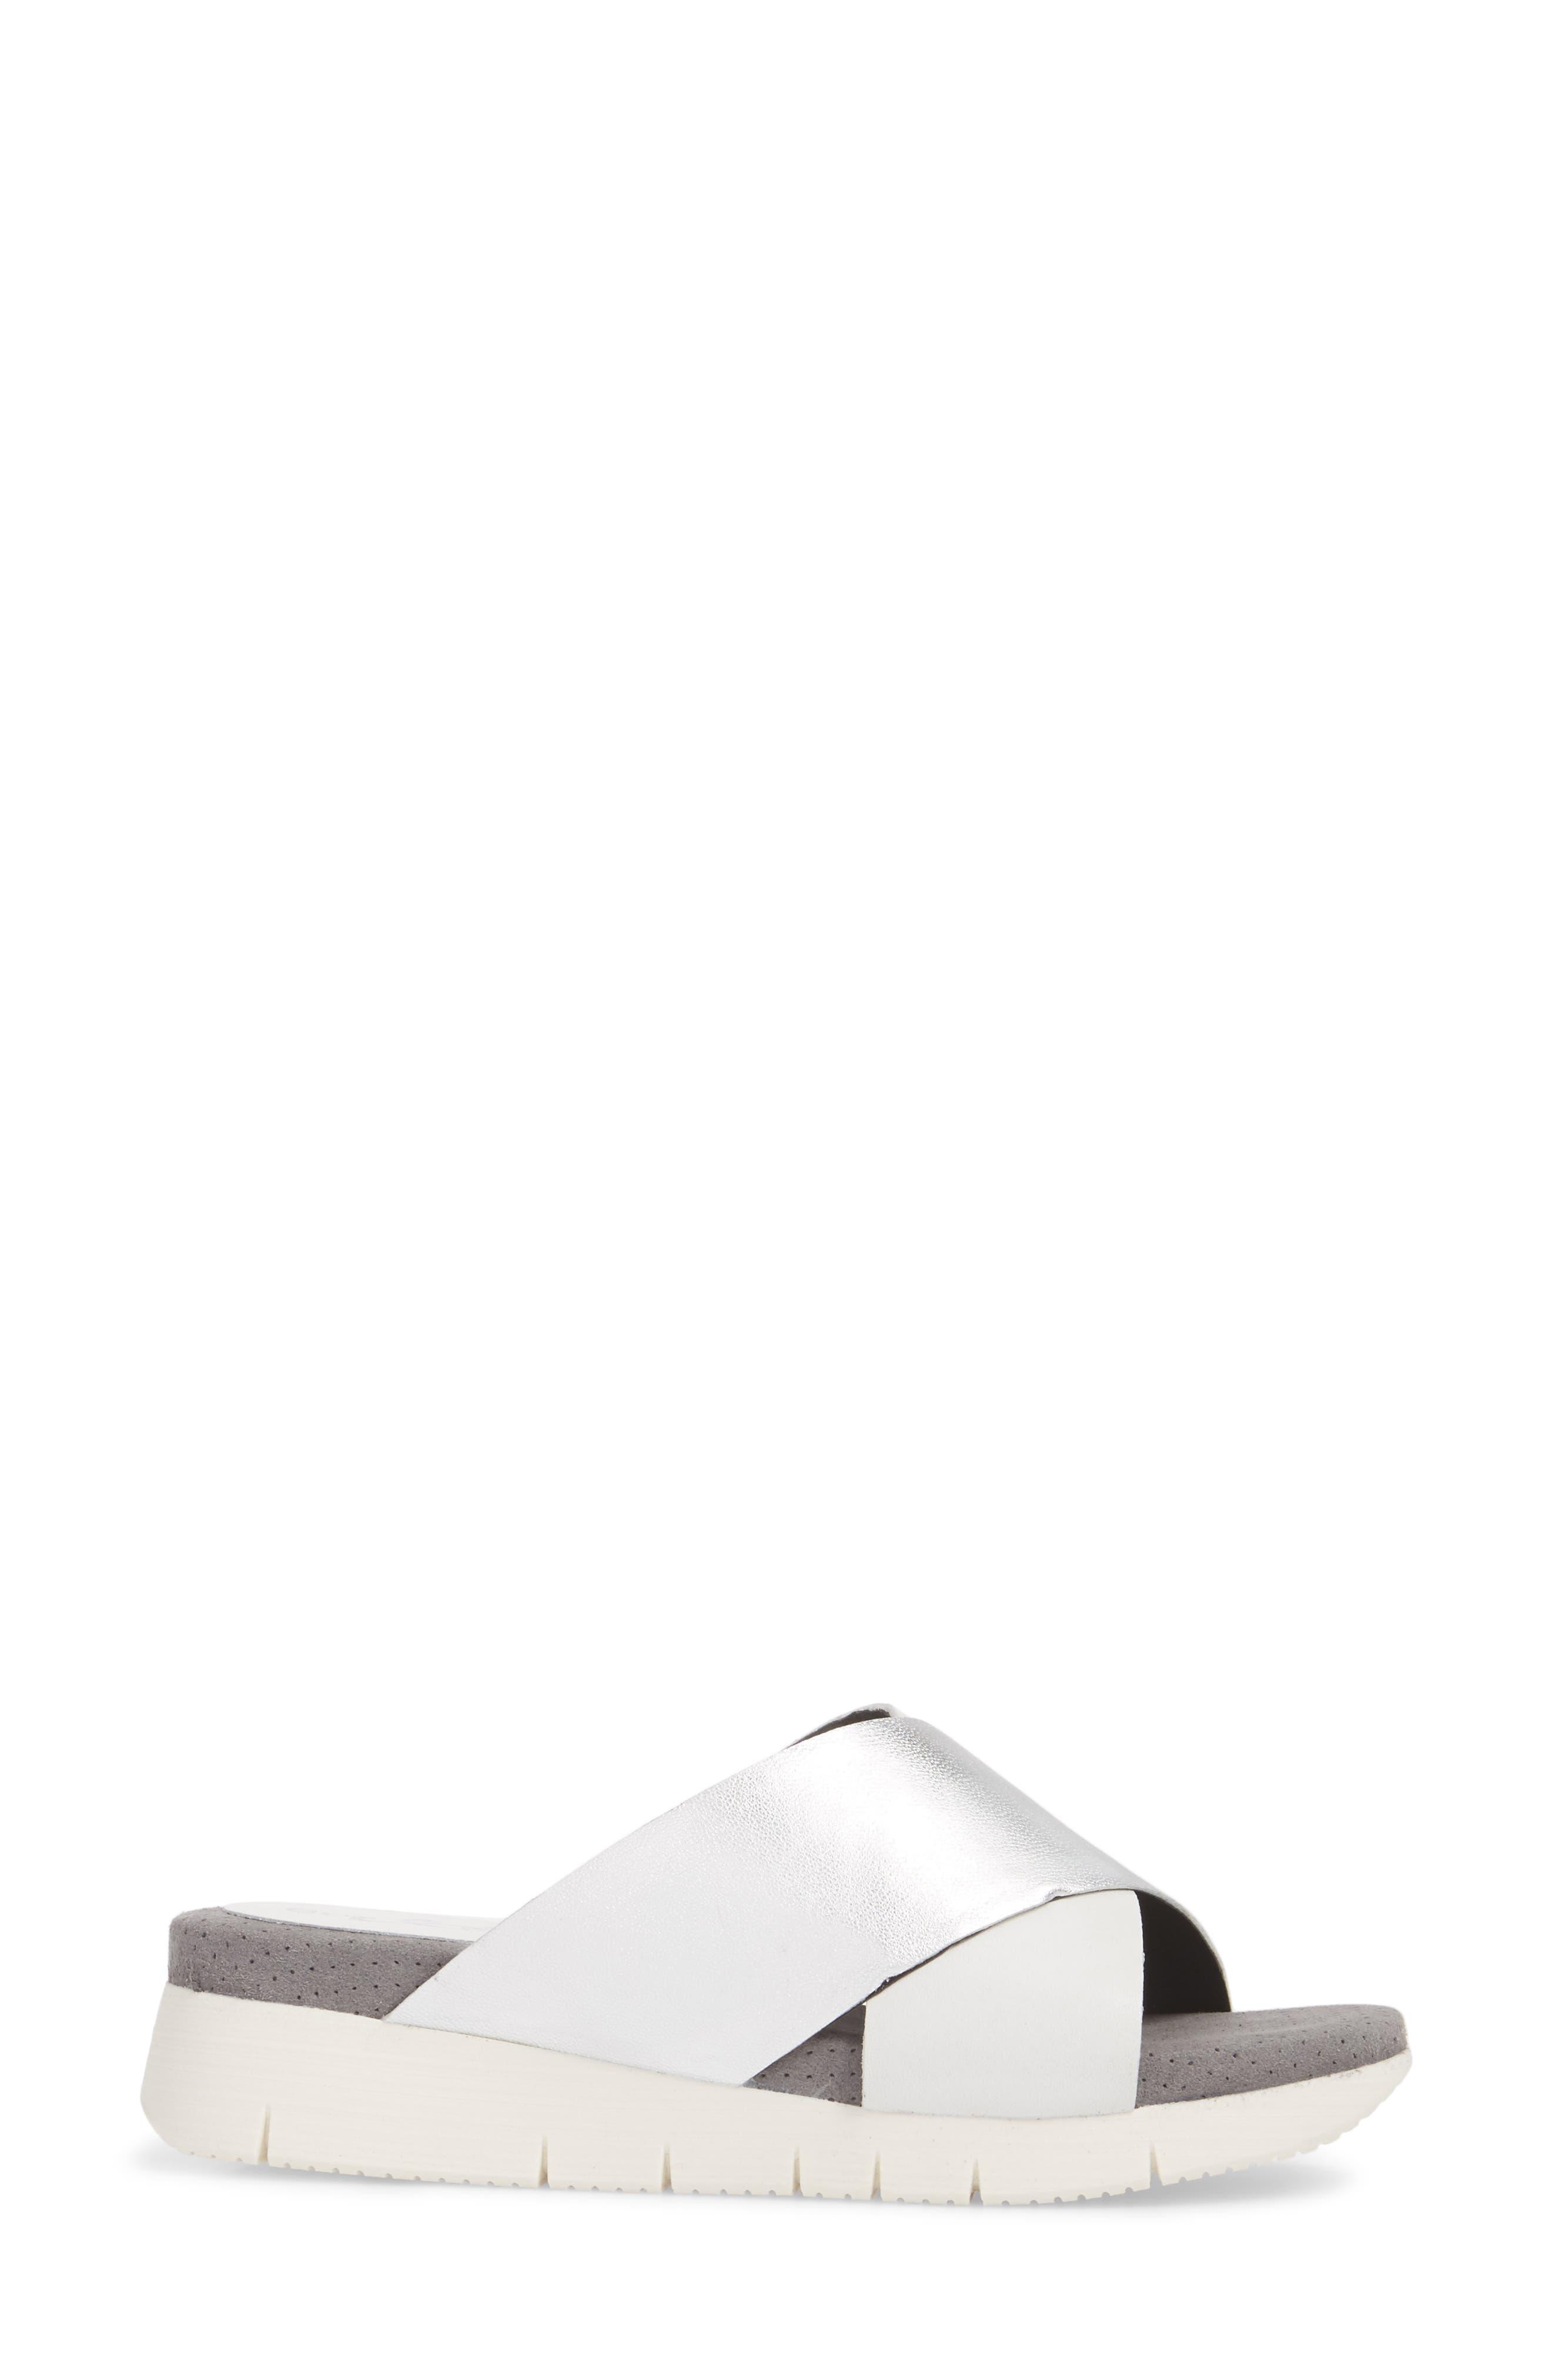 Piney Slide Sandal,                             Alternate thumbnail 3, color,                             White/ Silver Leather